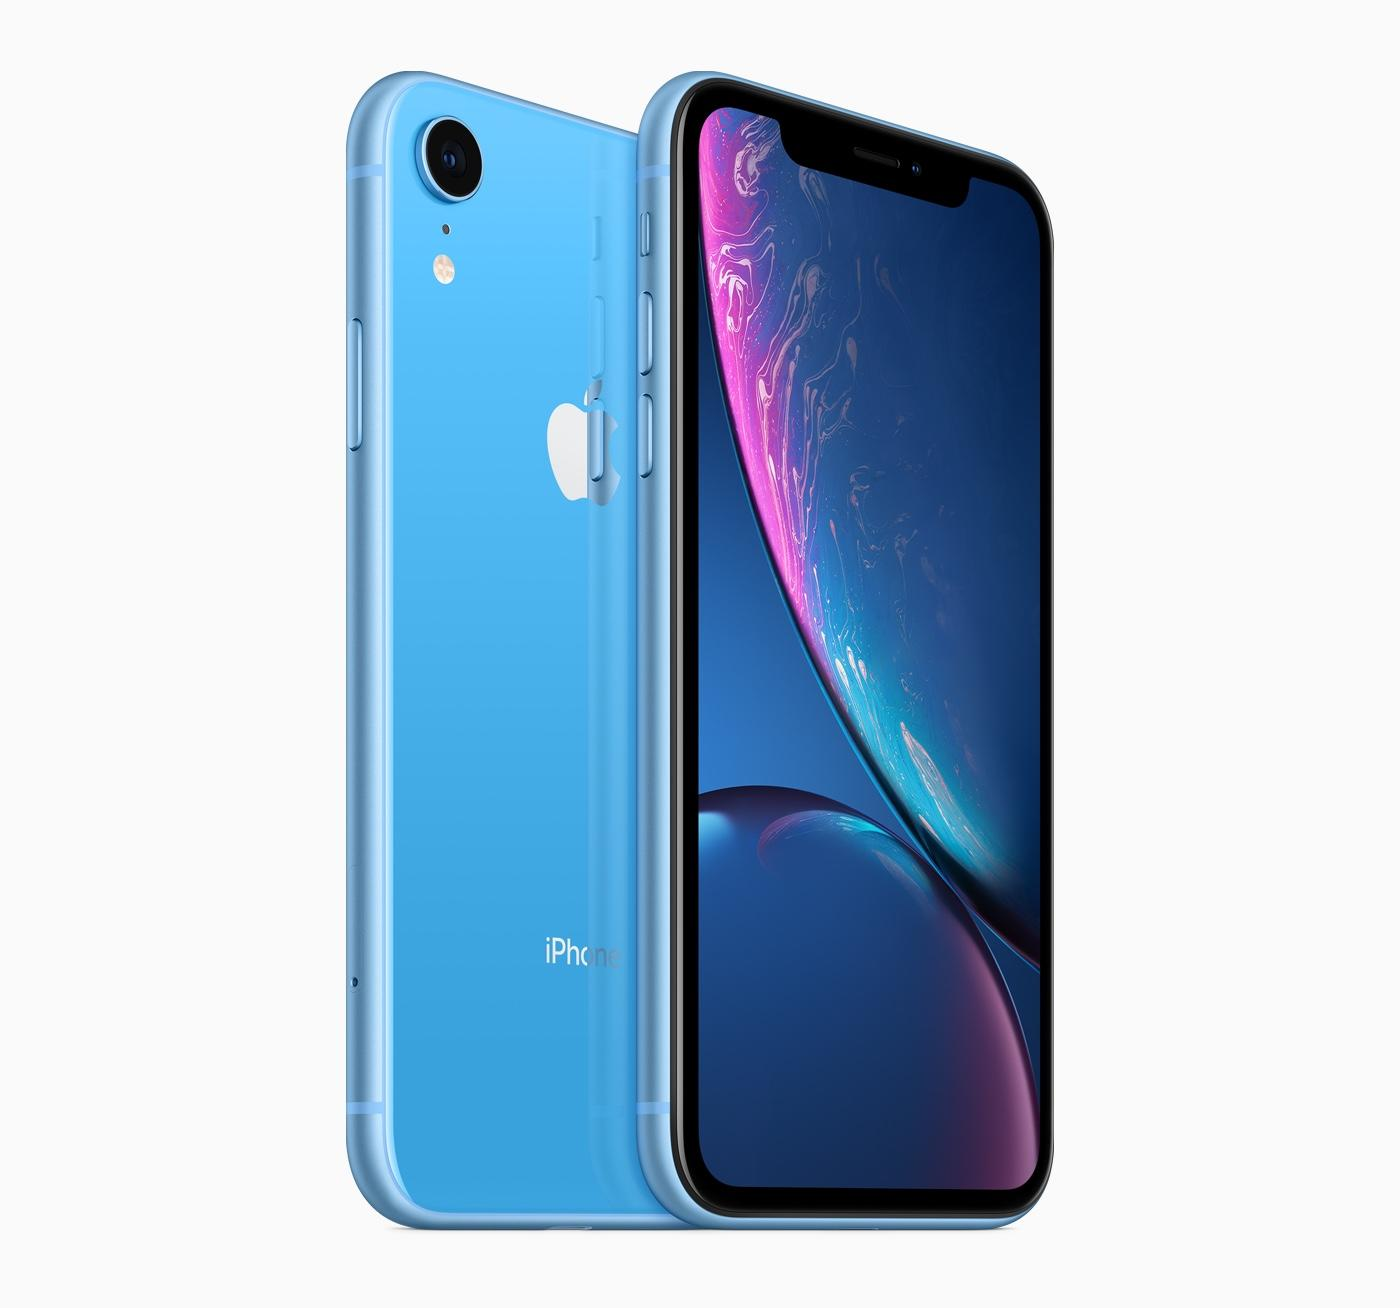 0e806fae71b iPhone XR review